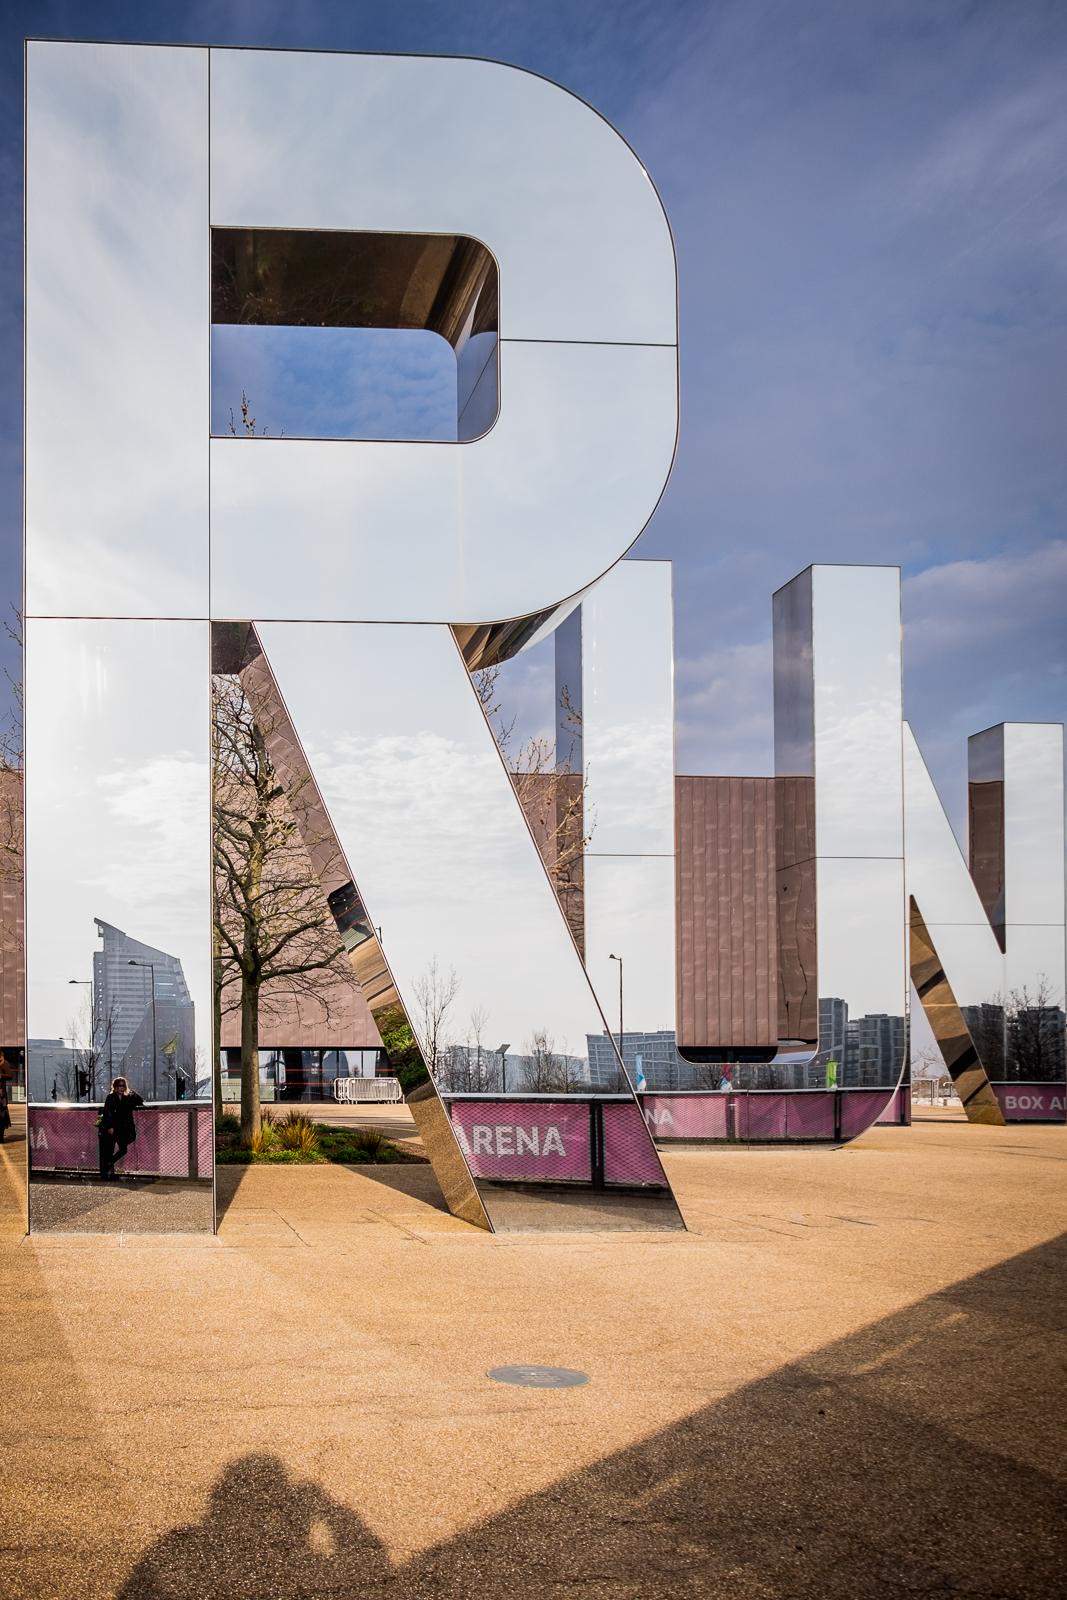 20160411_Hackney_Copper-Box-Arena_Run